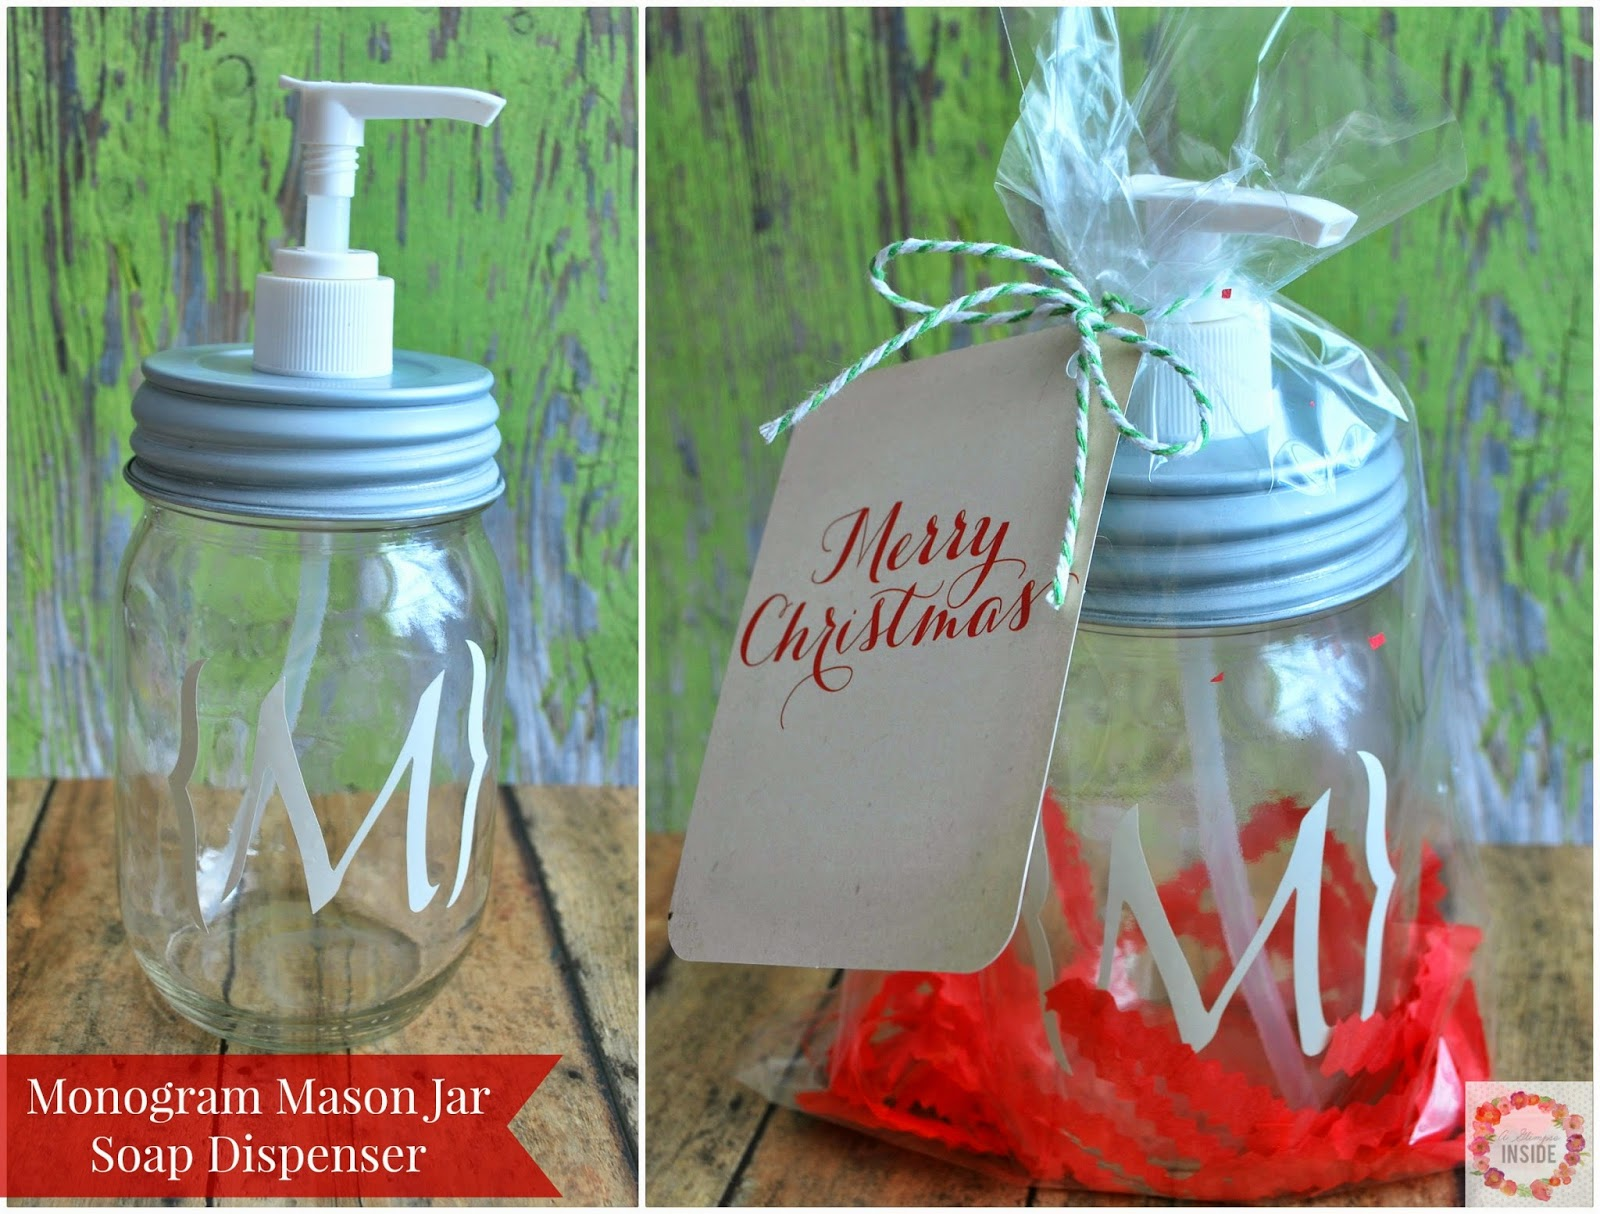 http://www.aglimpseinsideblog.com/2014/12/monogram-mason-jar-soap-dispenser-easy.html